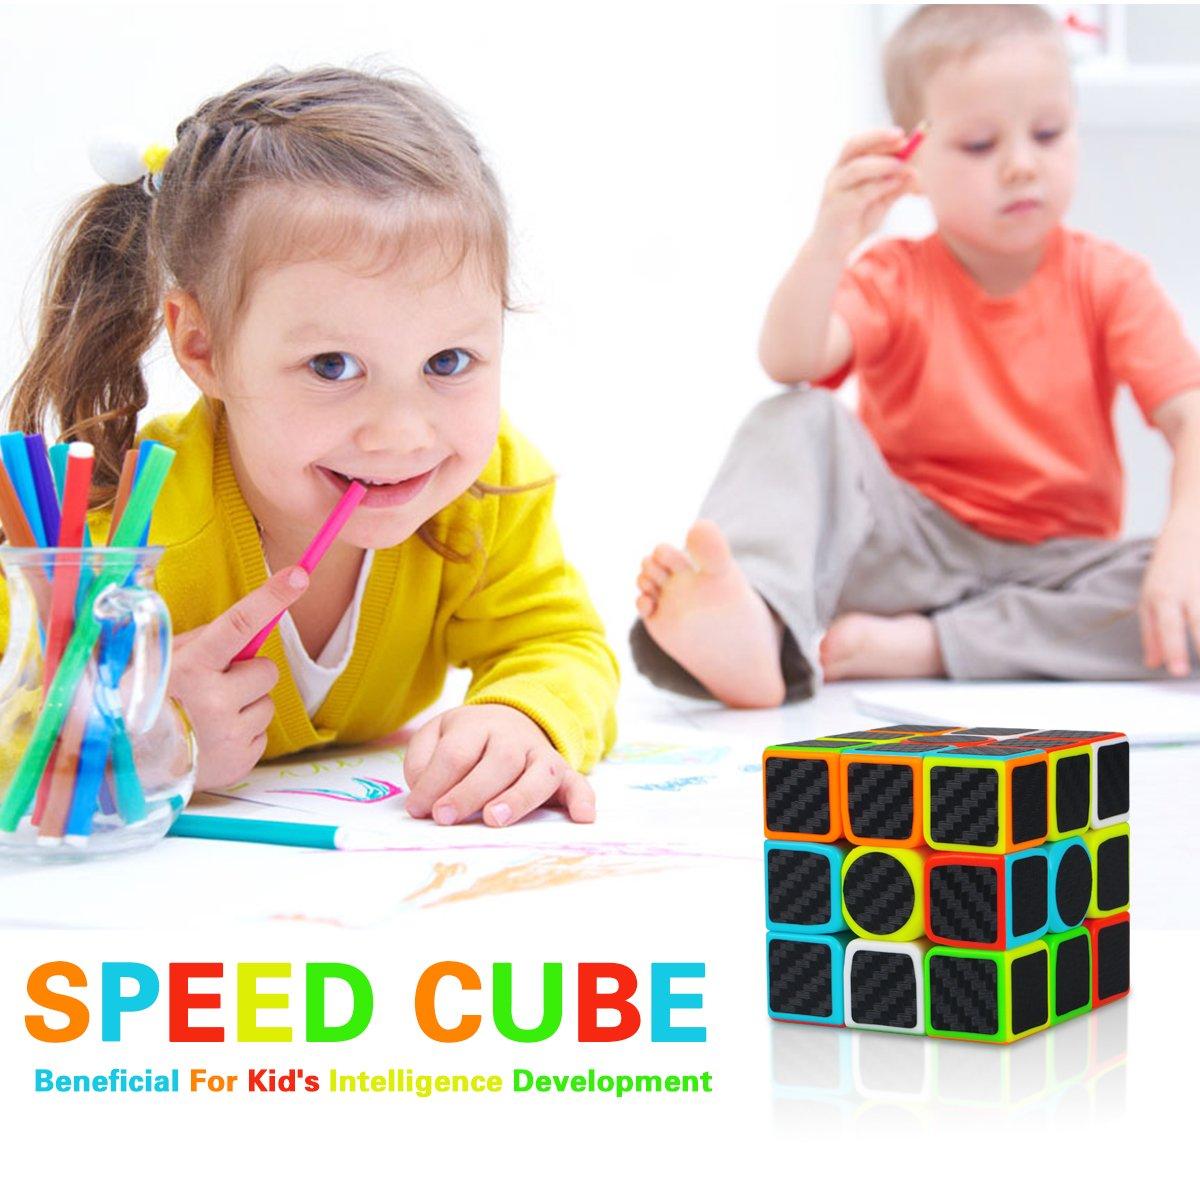 Aiduy 3x3x3 Zauberwürfel Speed Cube Kohlefaser Aufkleber für Smooth Magic Würfel Puzzles